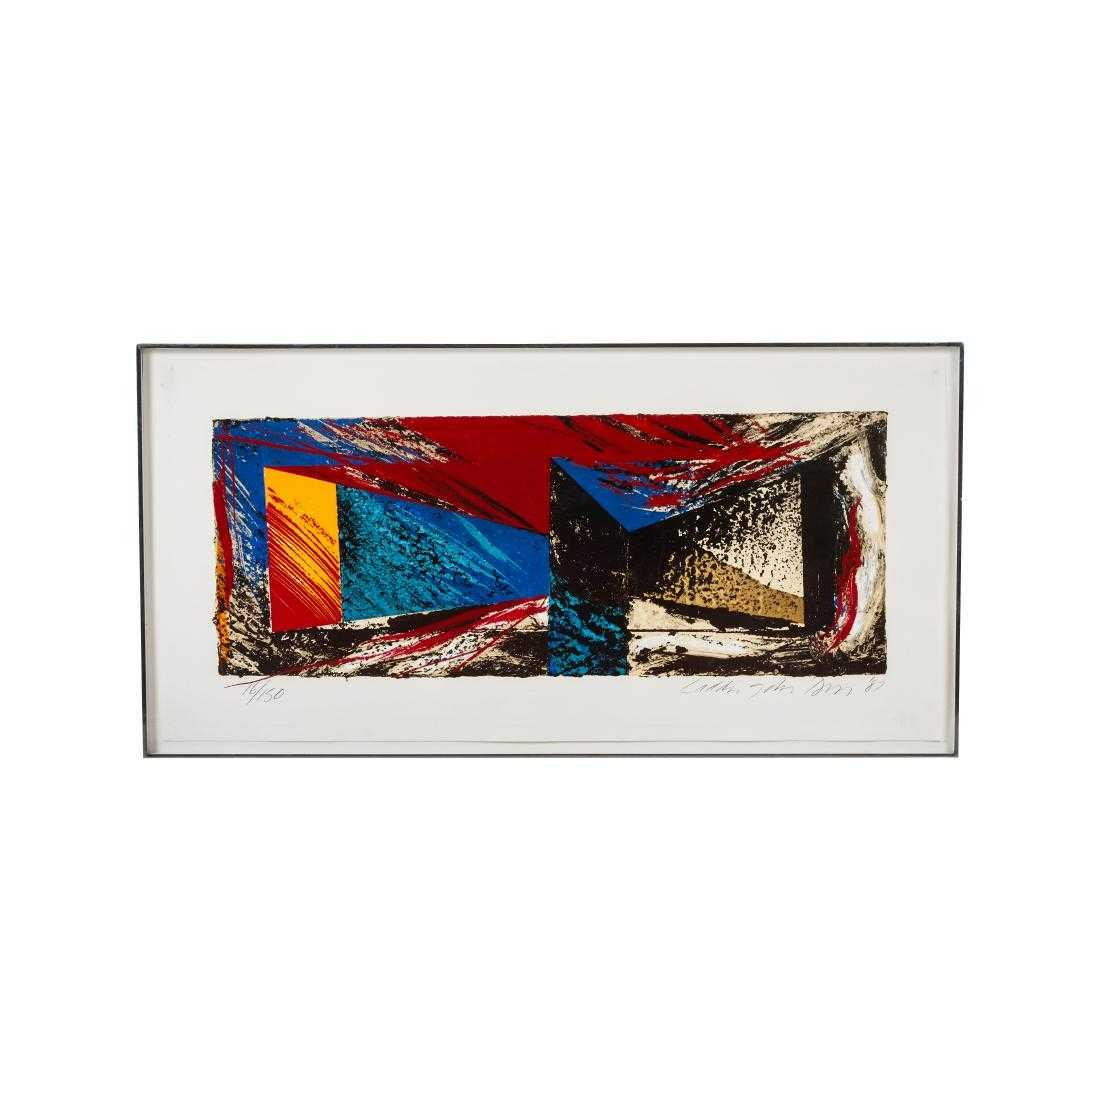 Laddie John Dill silk screen